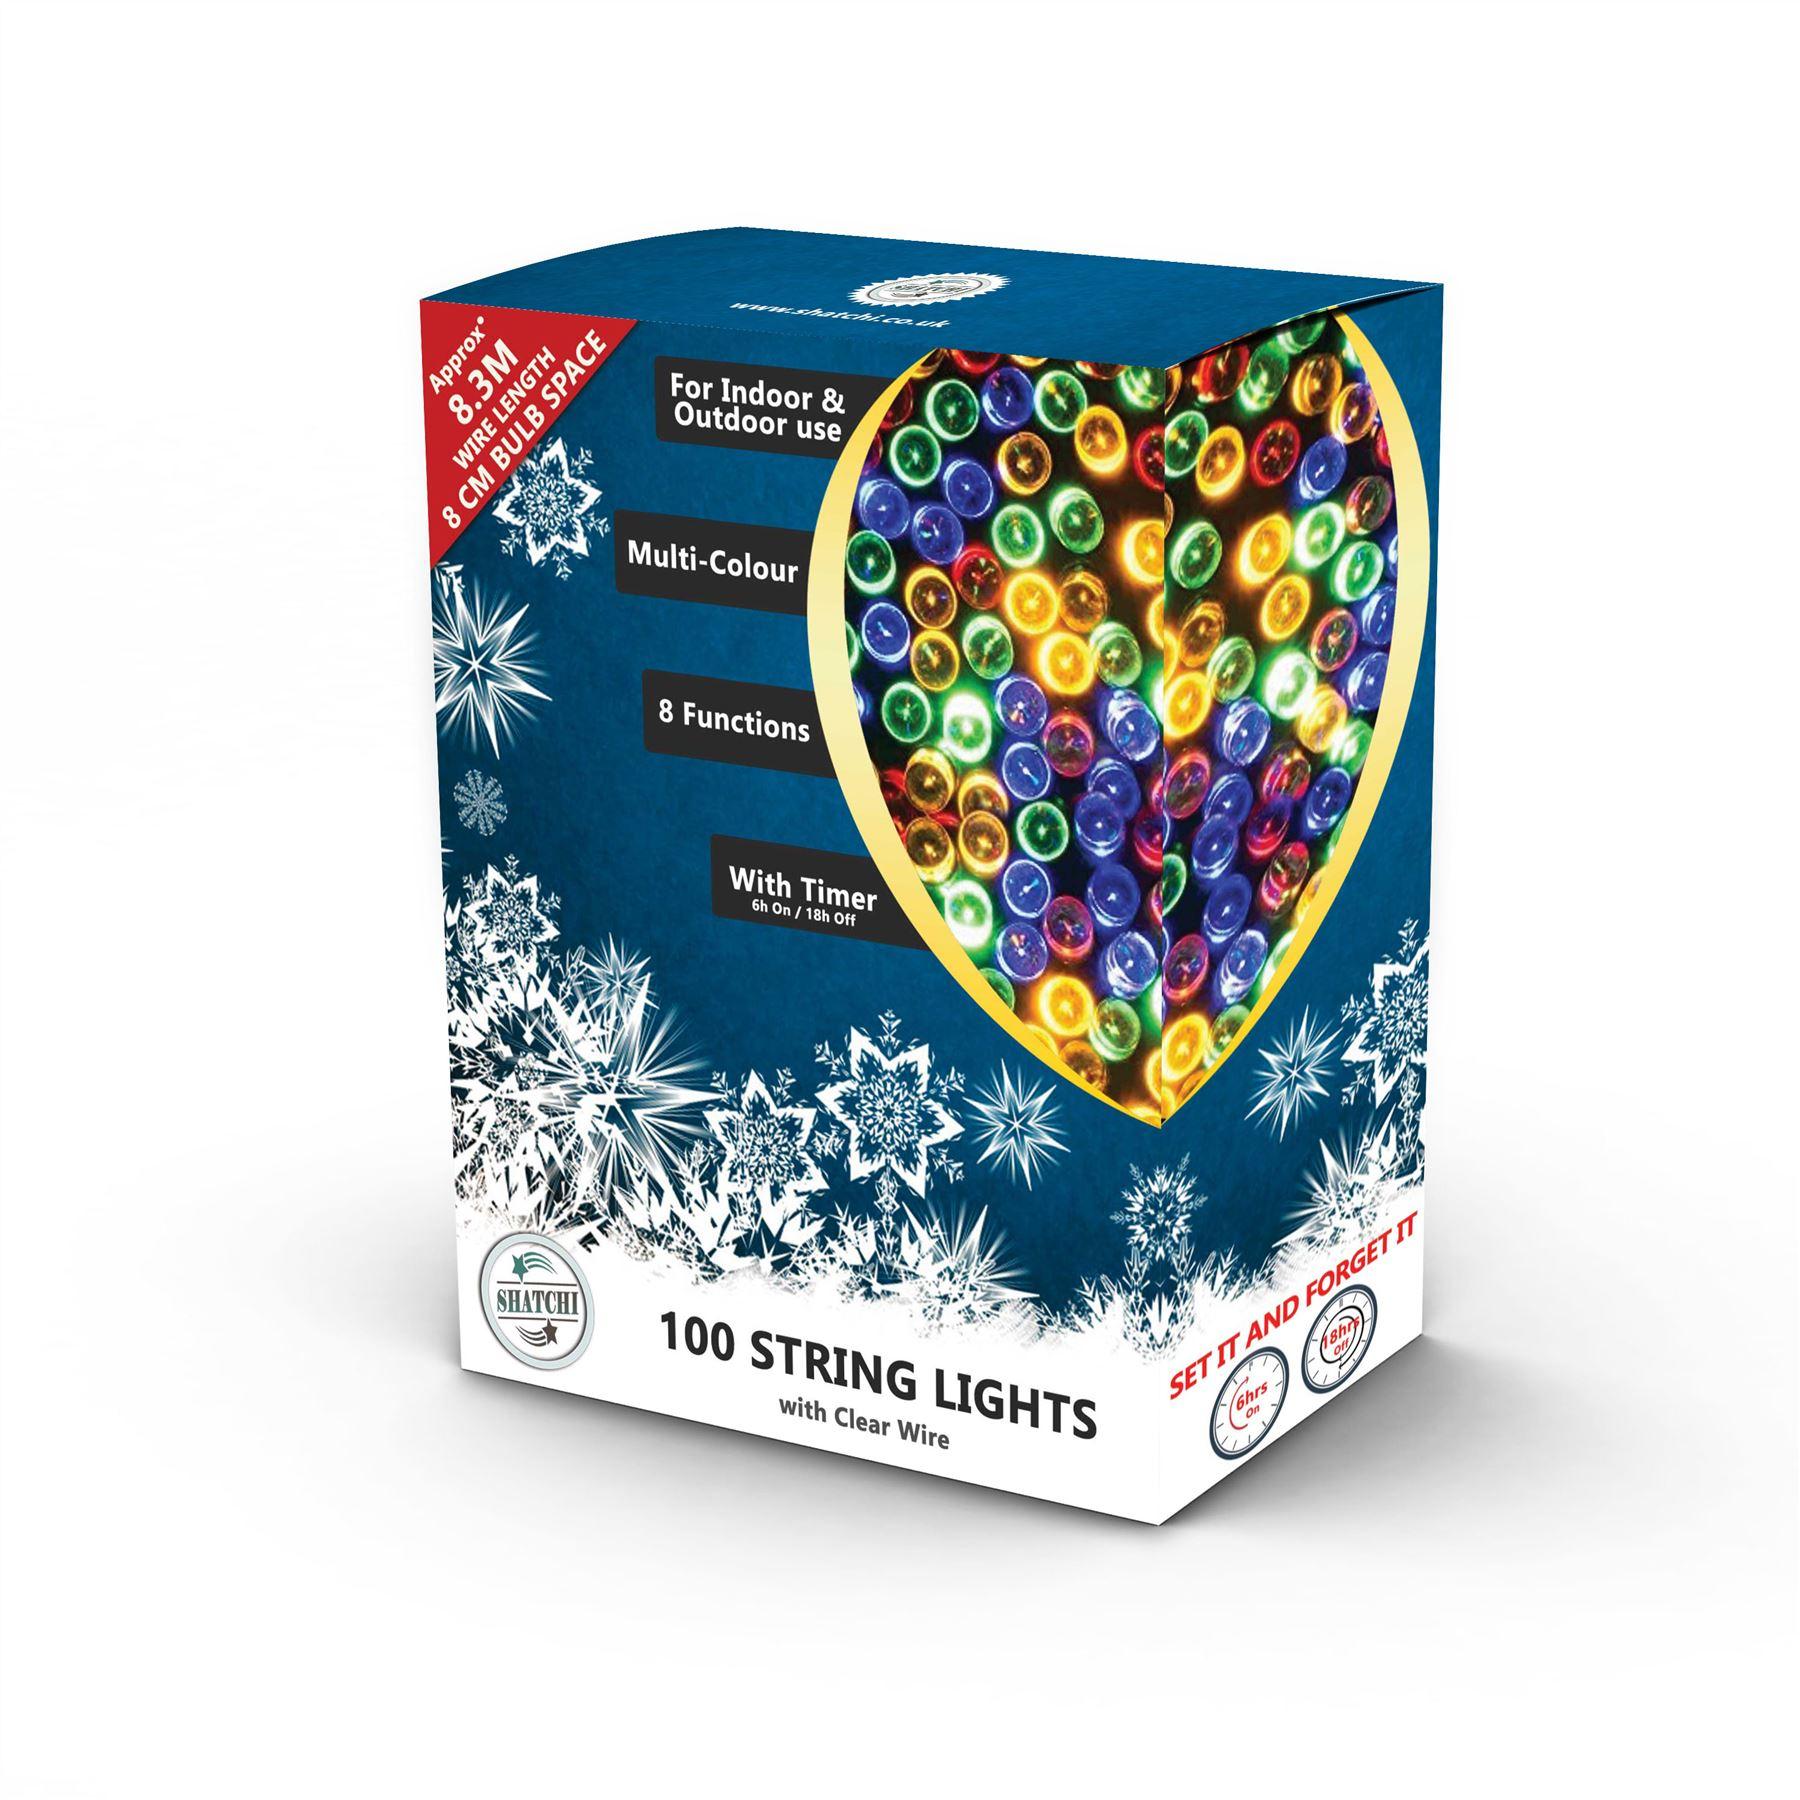 100-200-300-400-500-LED-Christmas-String-Fairy-Lights-Xmas-Decorations-Tree miniature 31